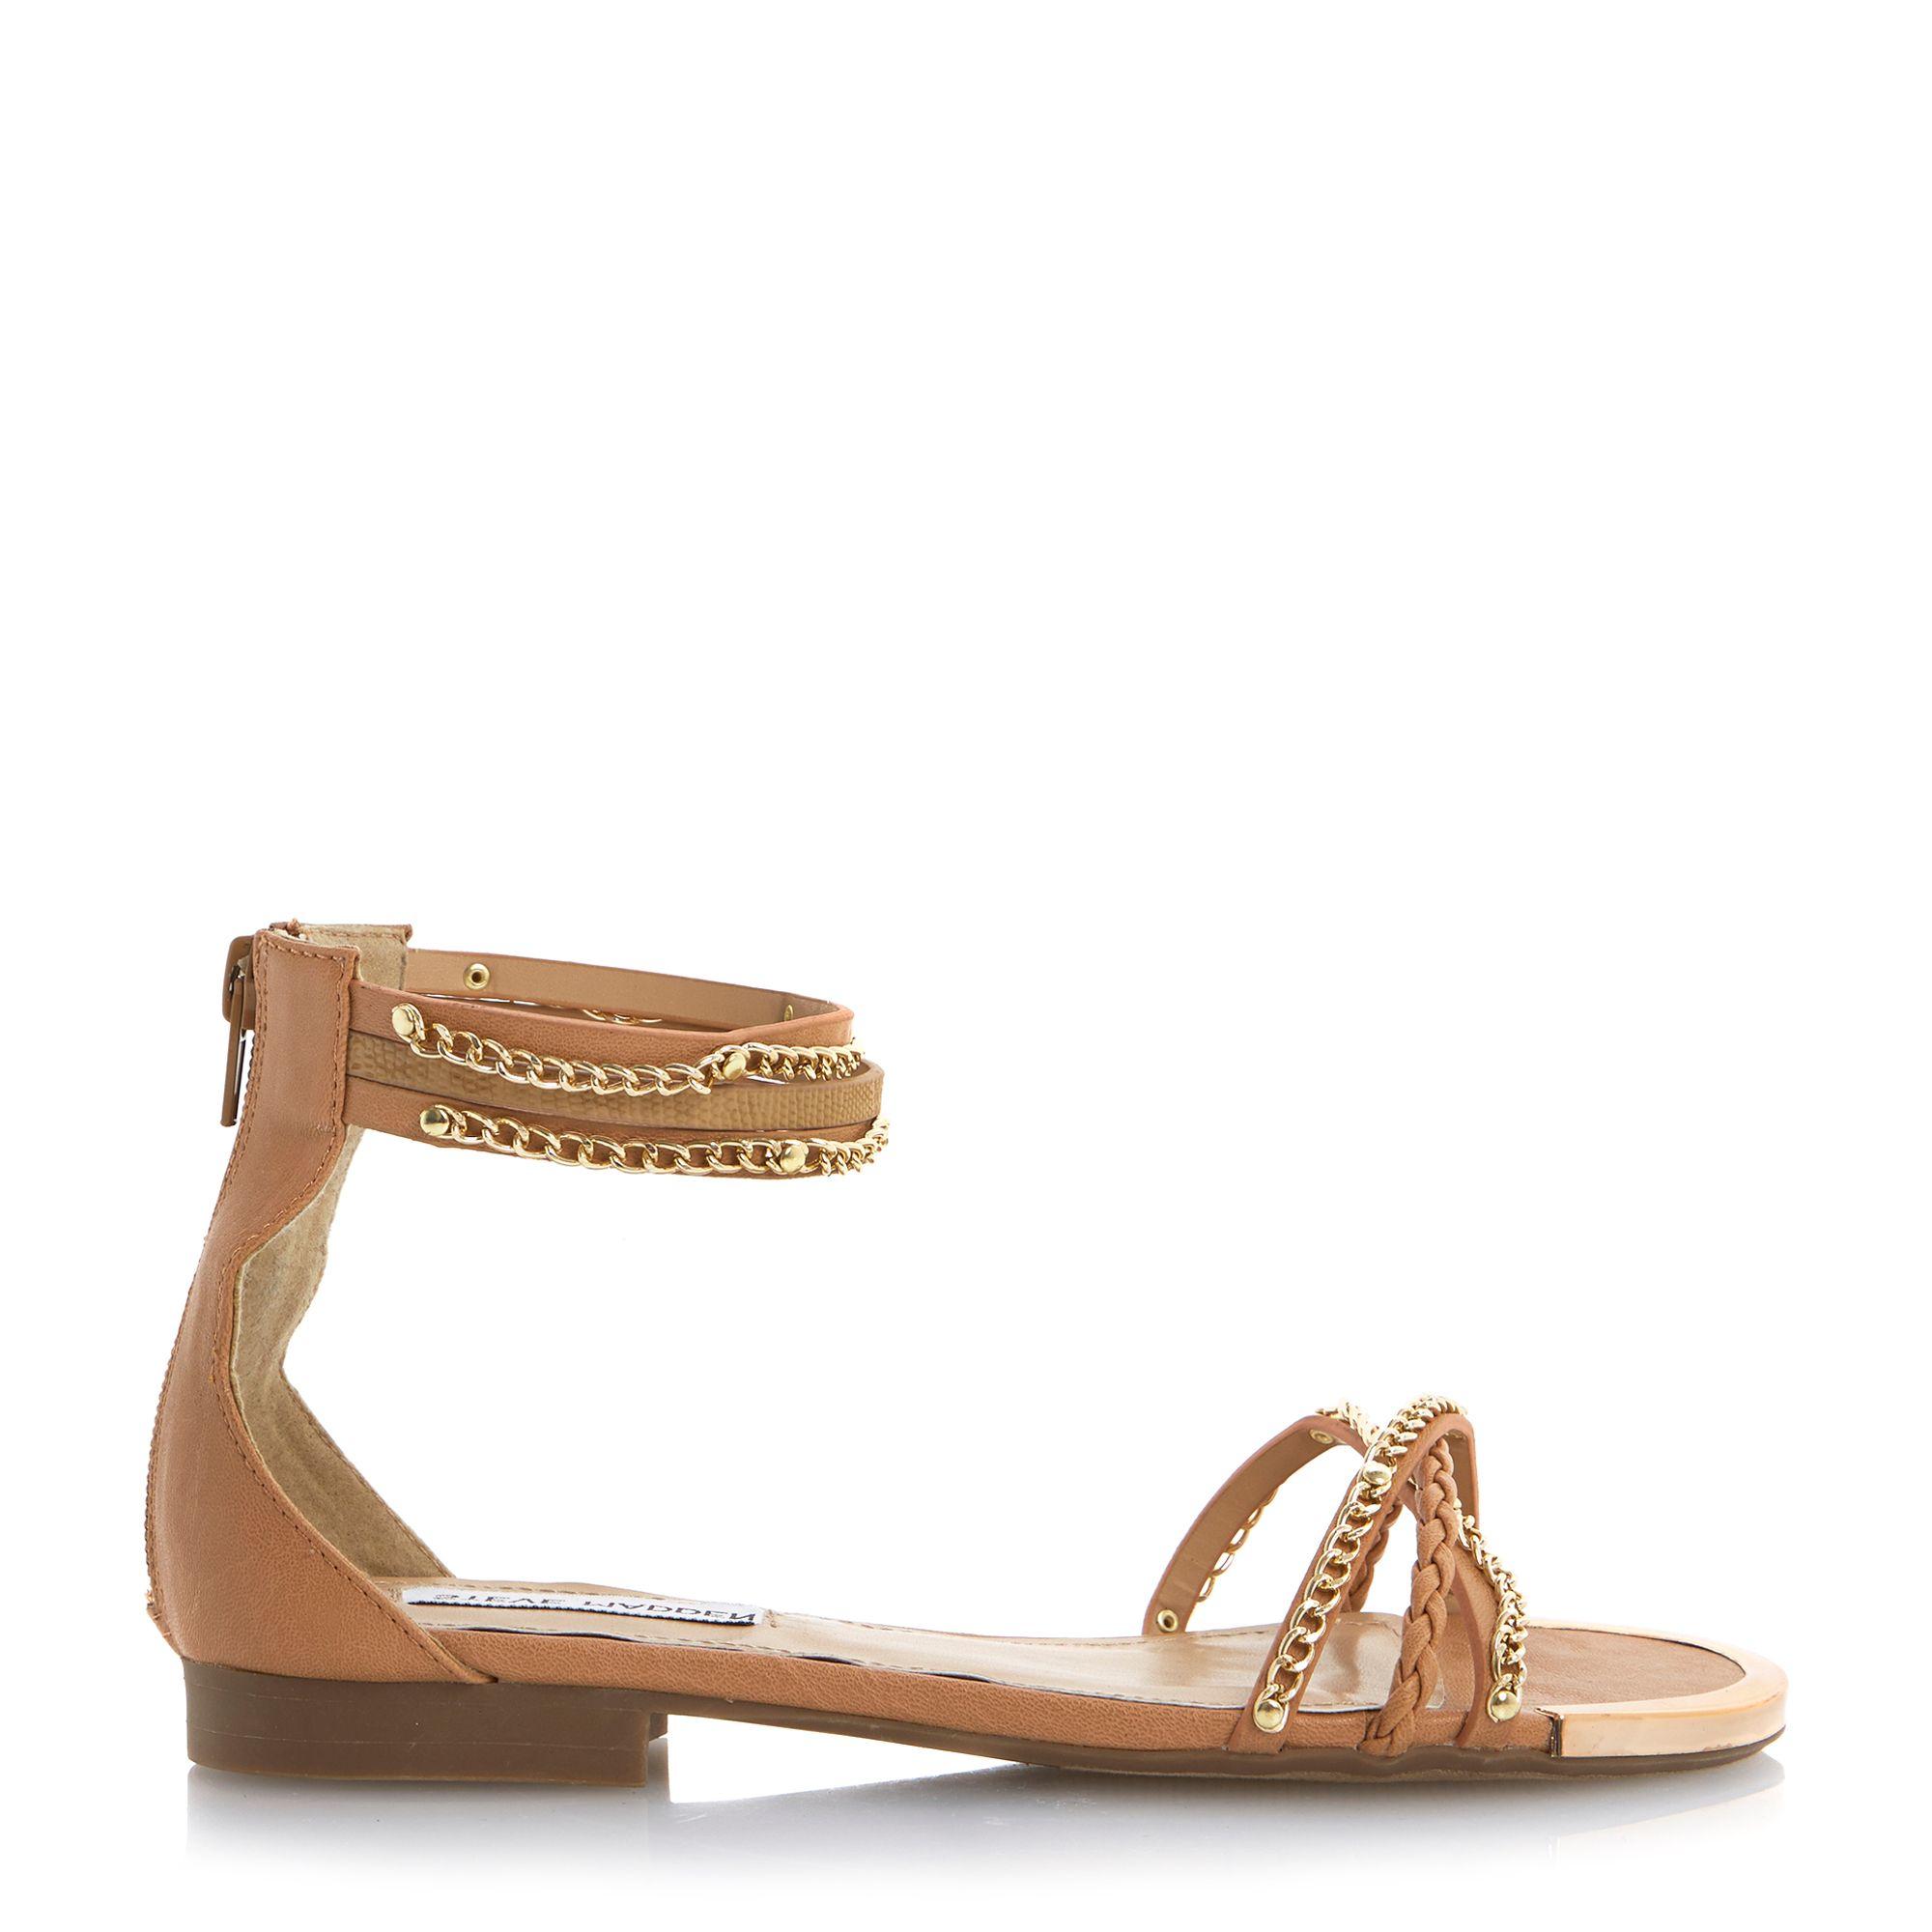 steve madden lawal flat chain cuff sandals in brown tan lyst. Black Bedroom Furniture Sets. Home Design Ideas